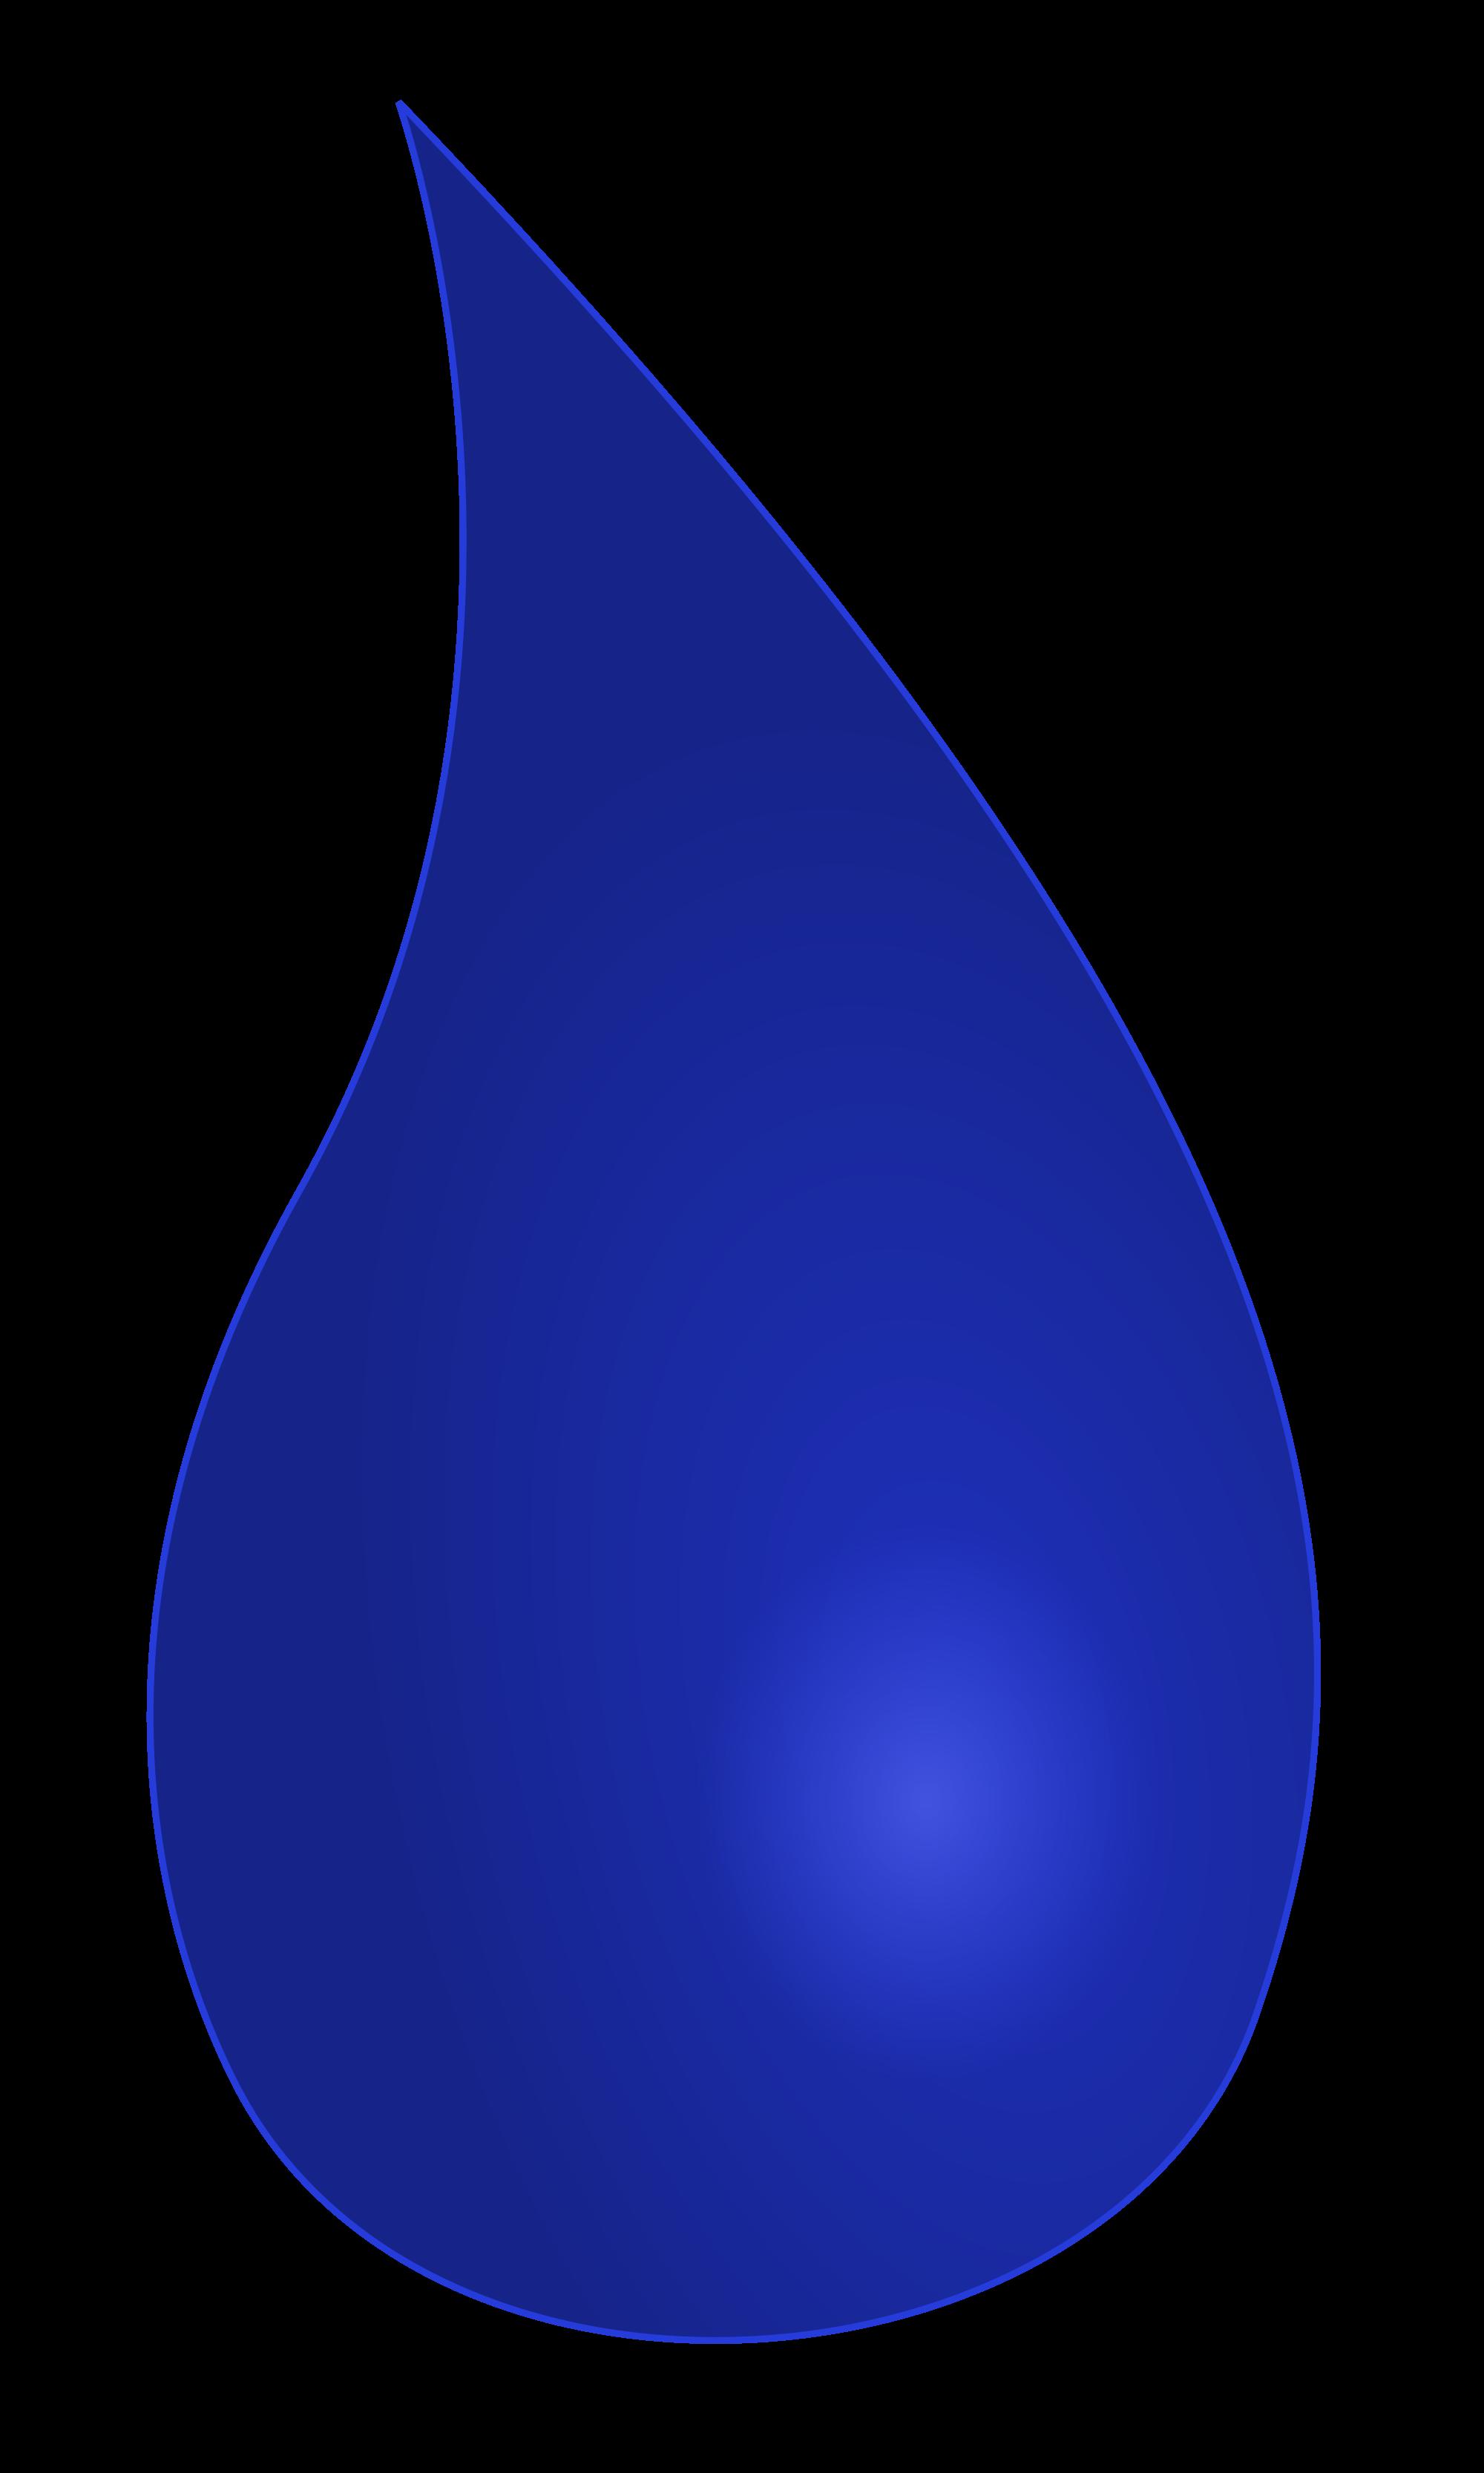 Water clipart water droplet. Blue drop transparent transparentpng